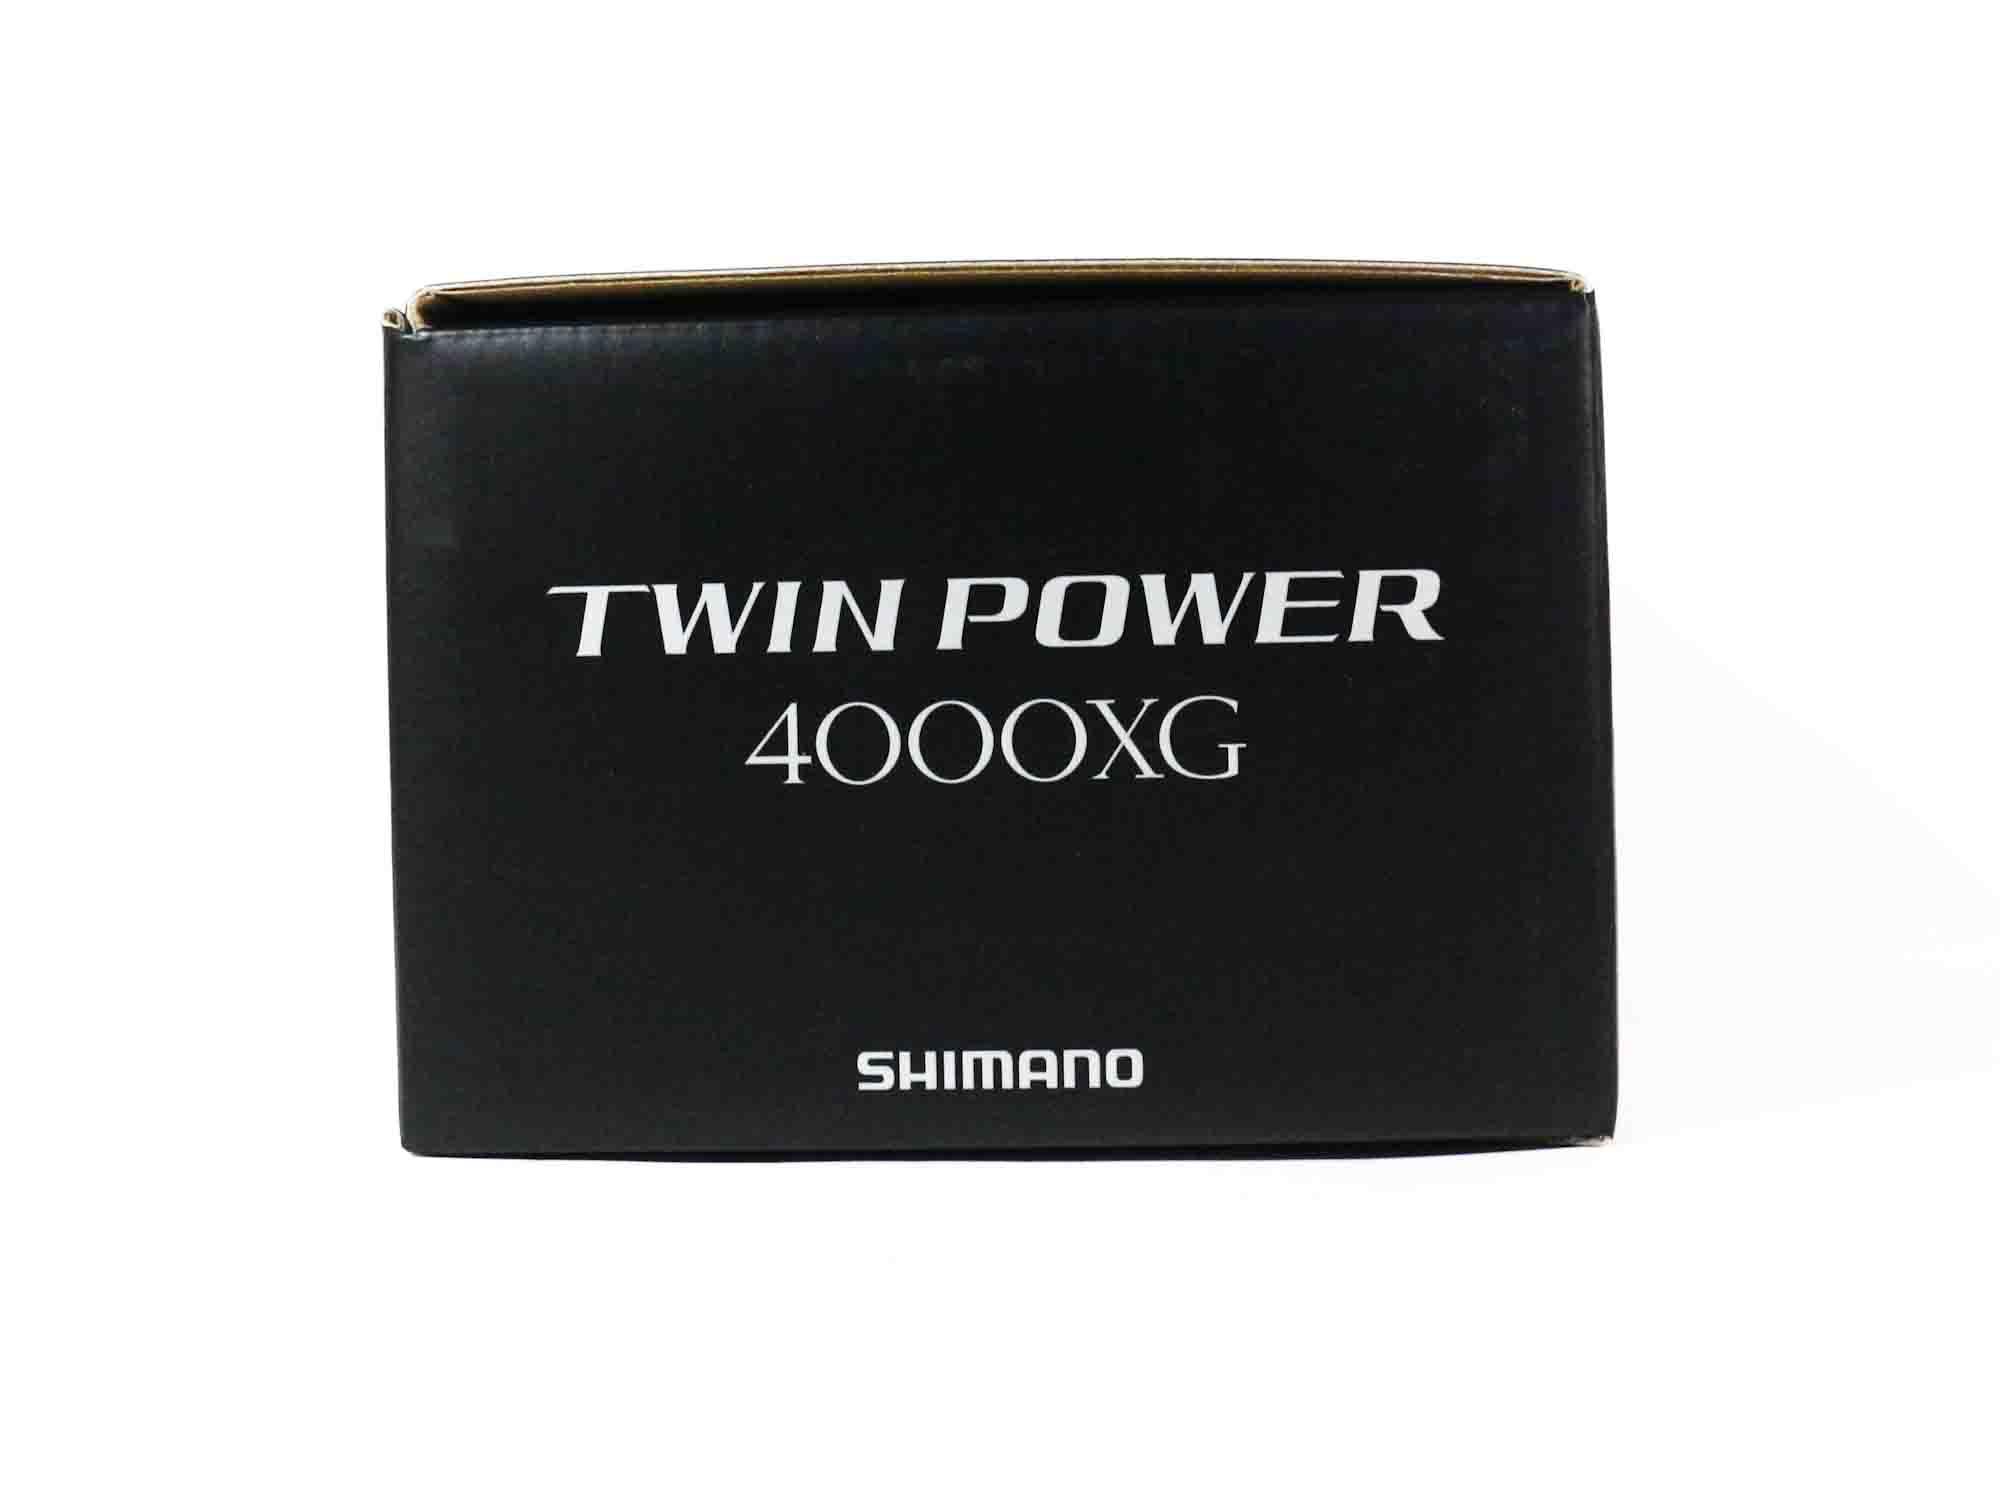 Shimano Reel Spinning Twinpower FD 4000 XG 2020 (2323)